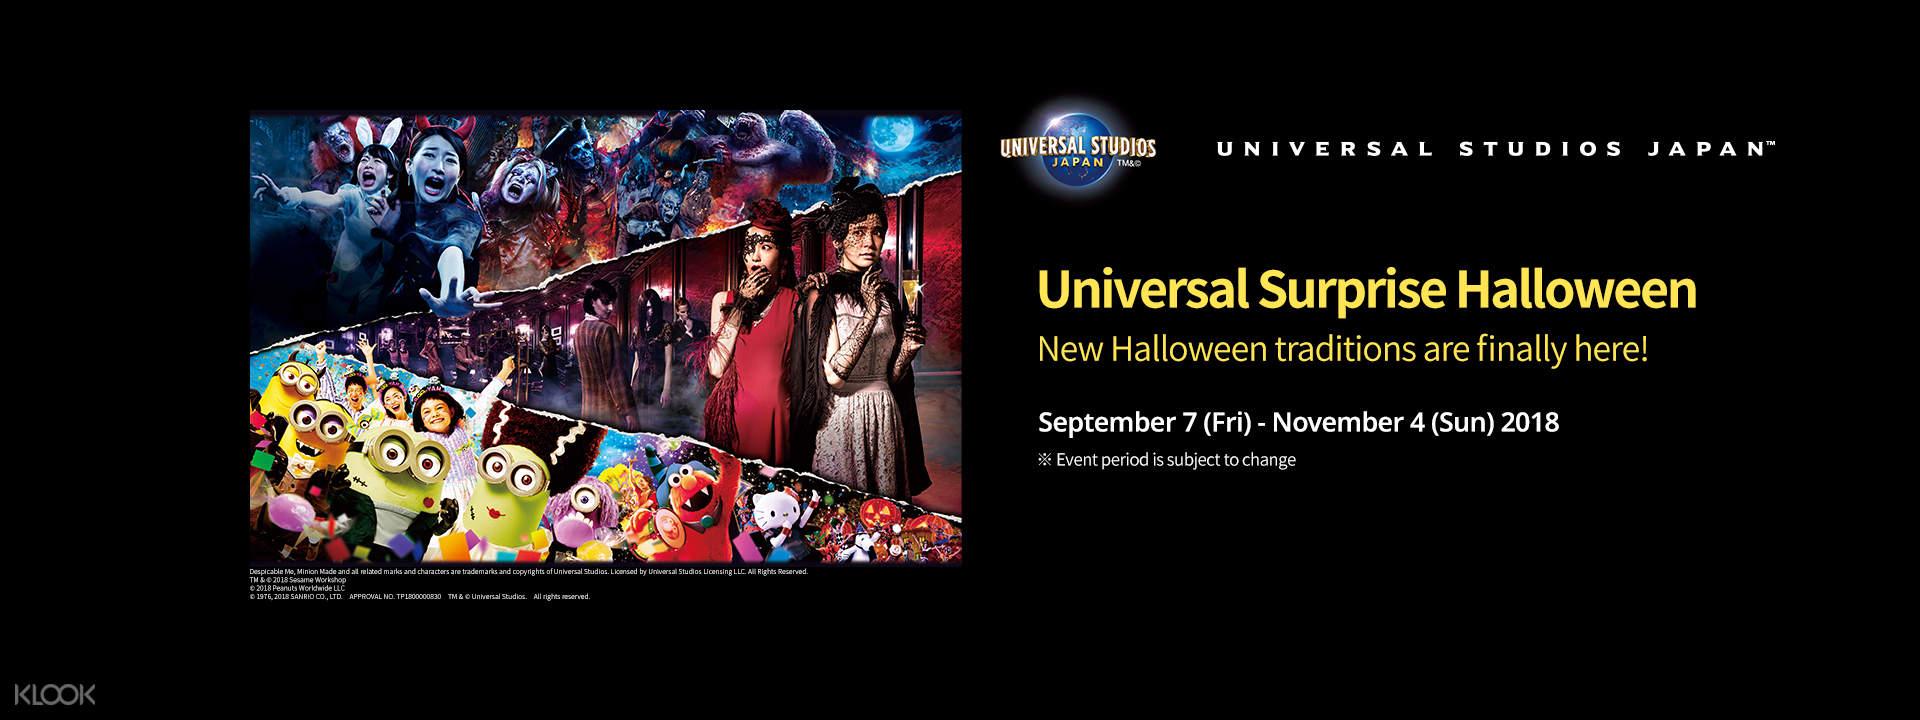 universal studios japan express pass halloween horror night osaka